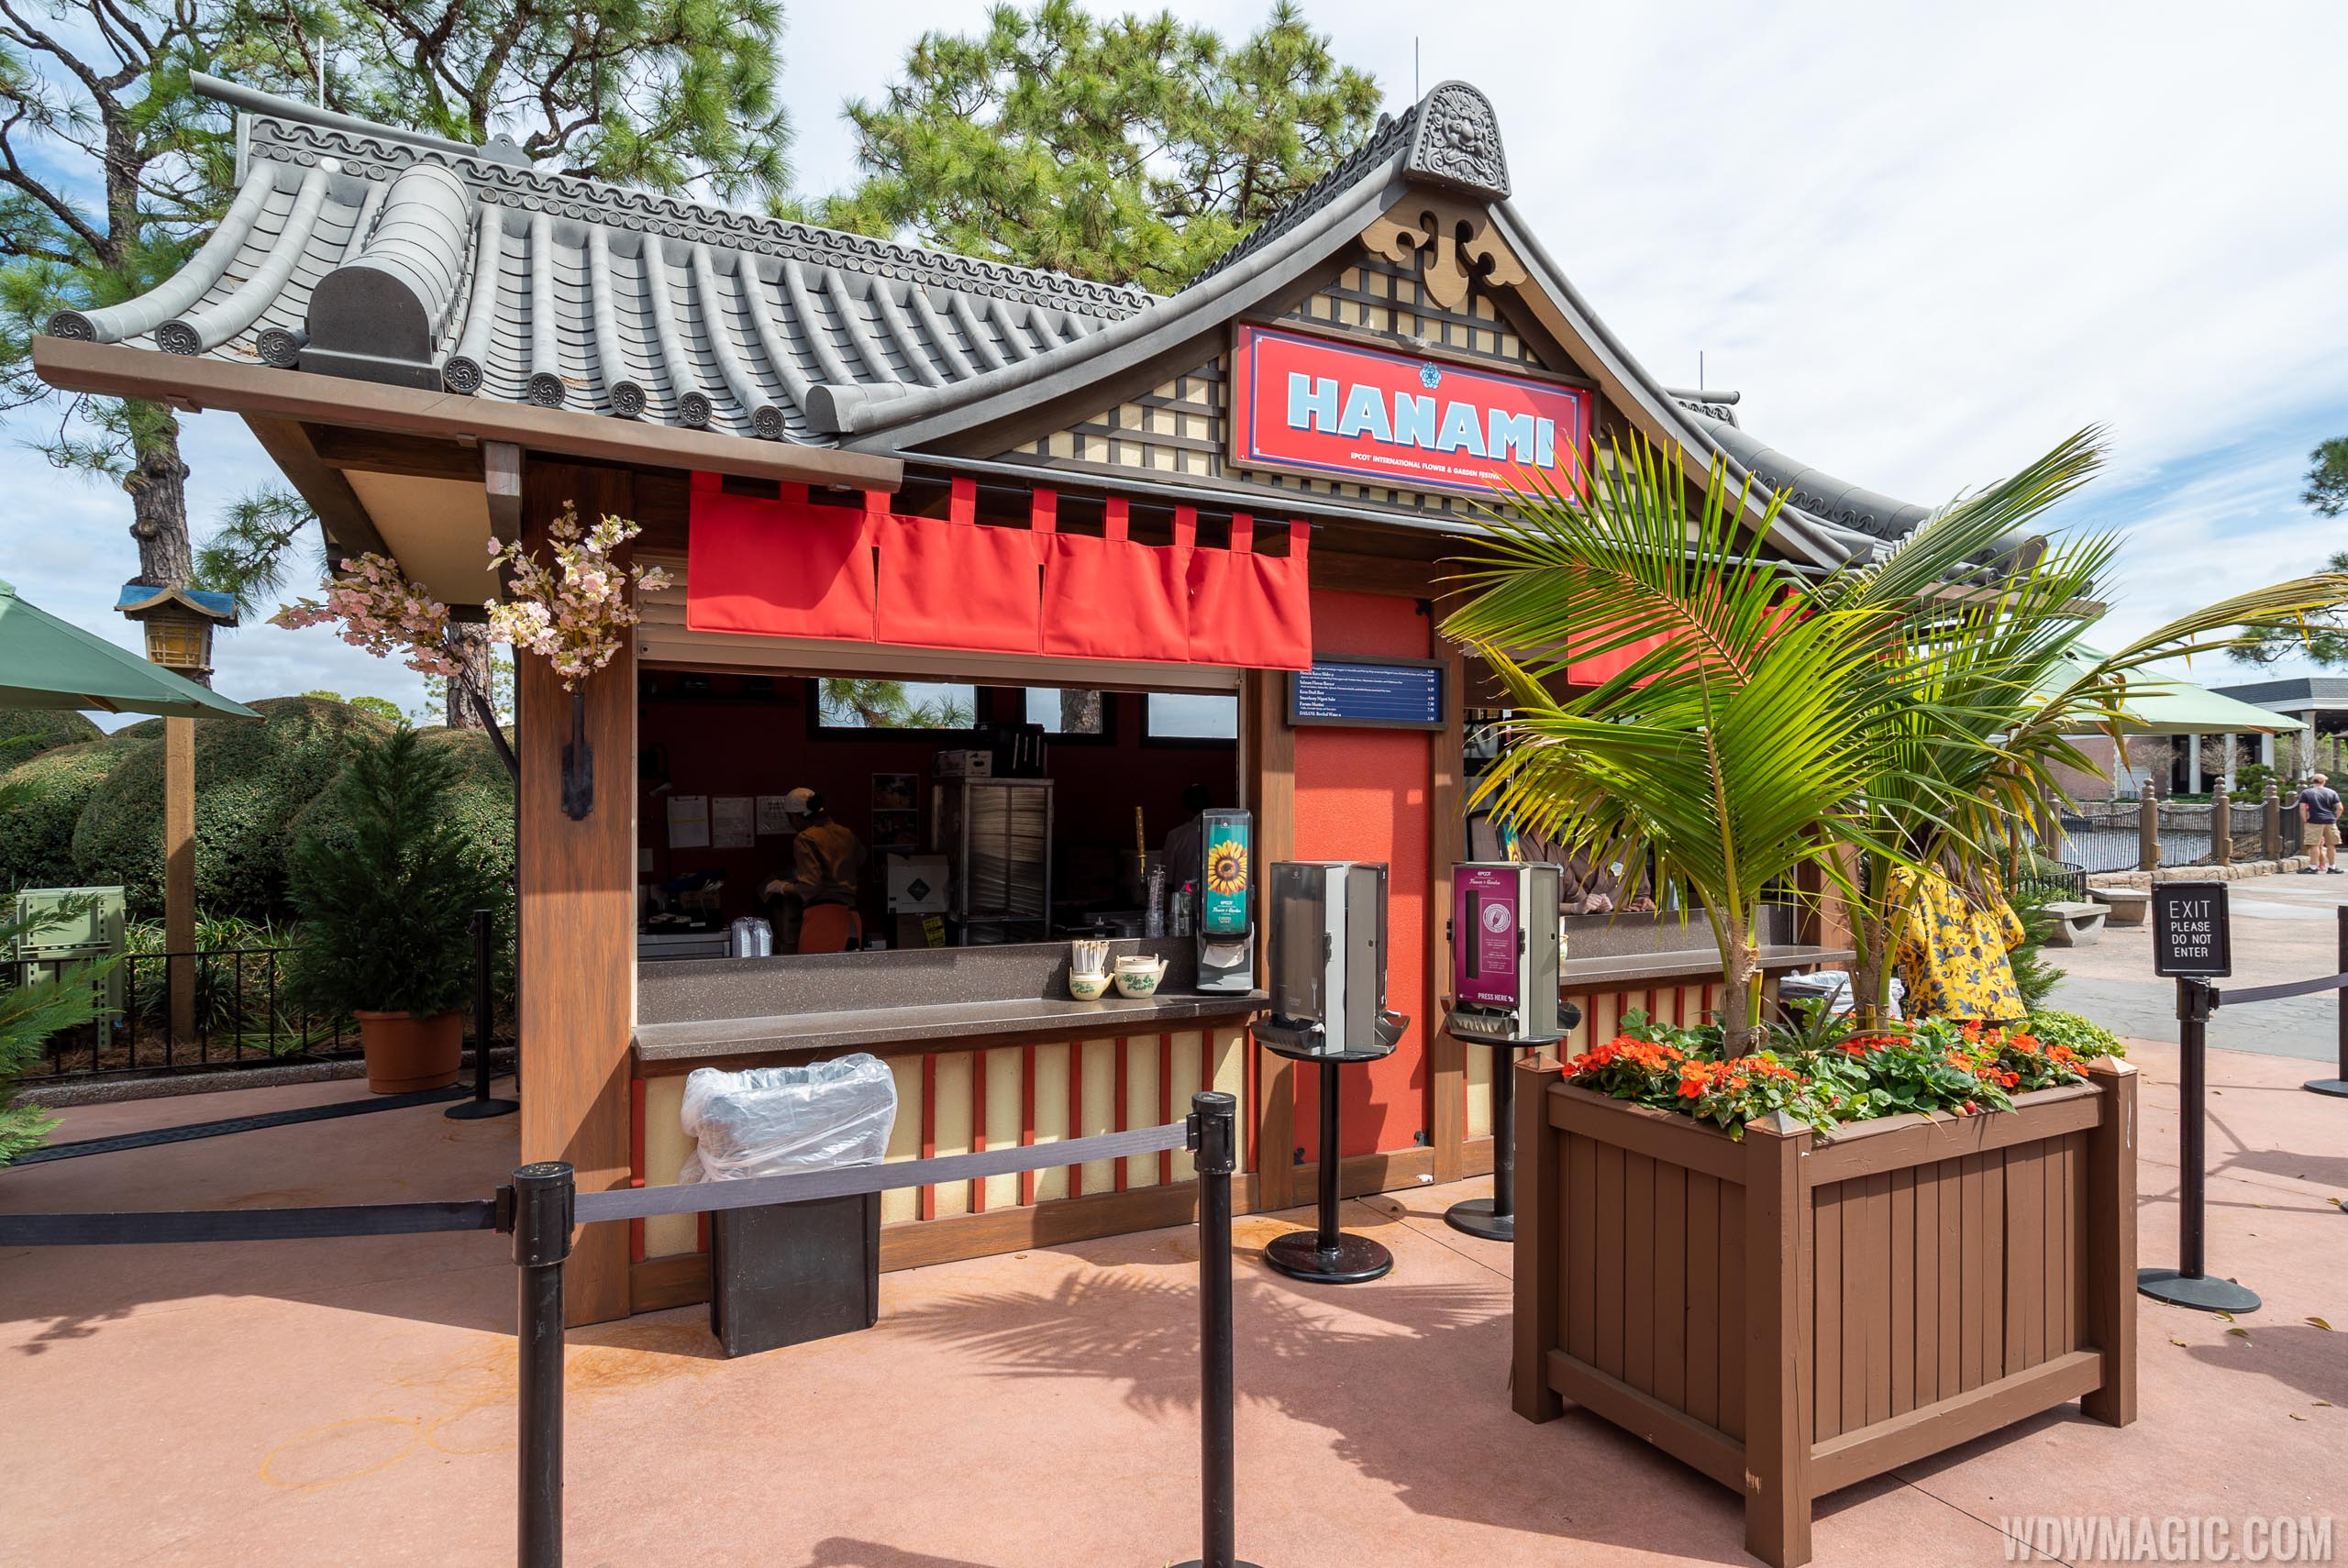 Epcot Flower and Garden Festival Outdoor Kitchen kiosks - Hanami